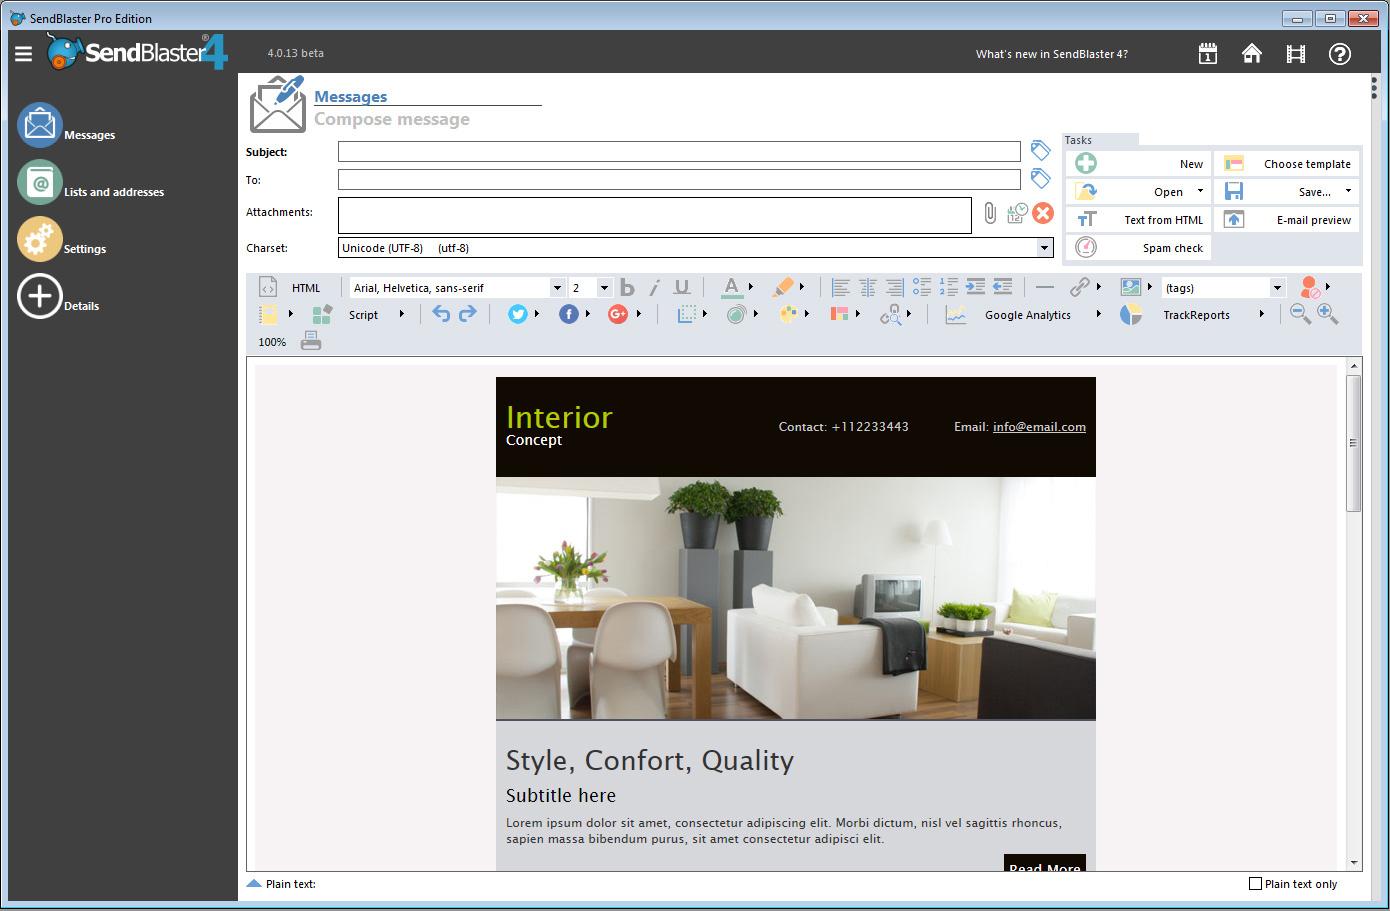 [Image: sendblaster-4-features-1.jpg]